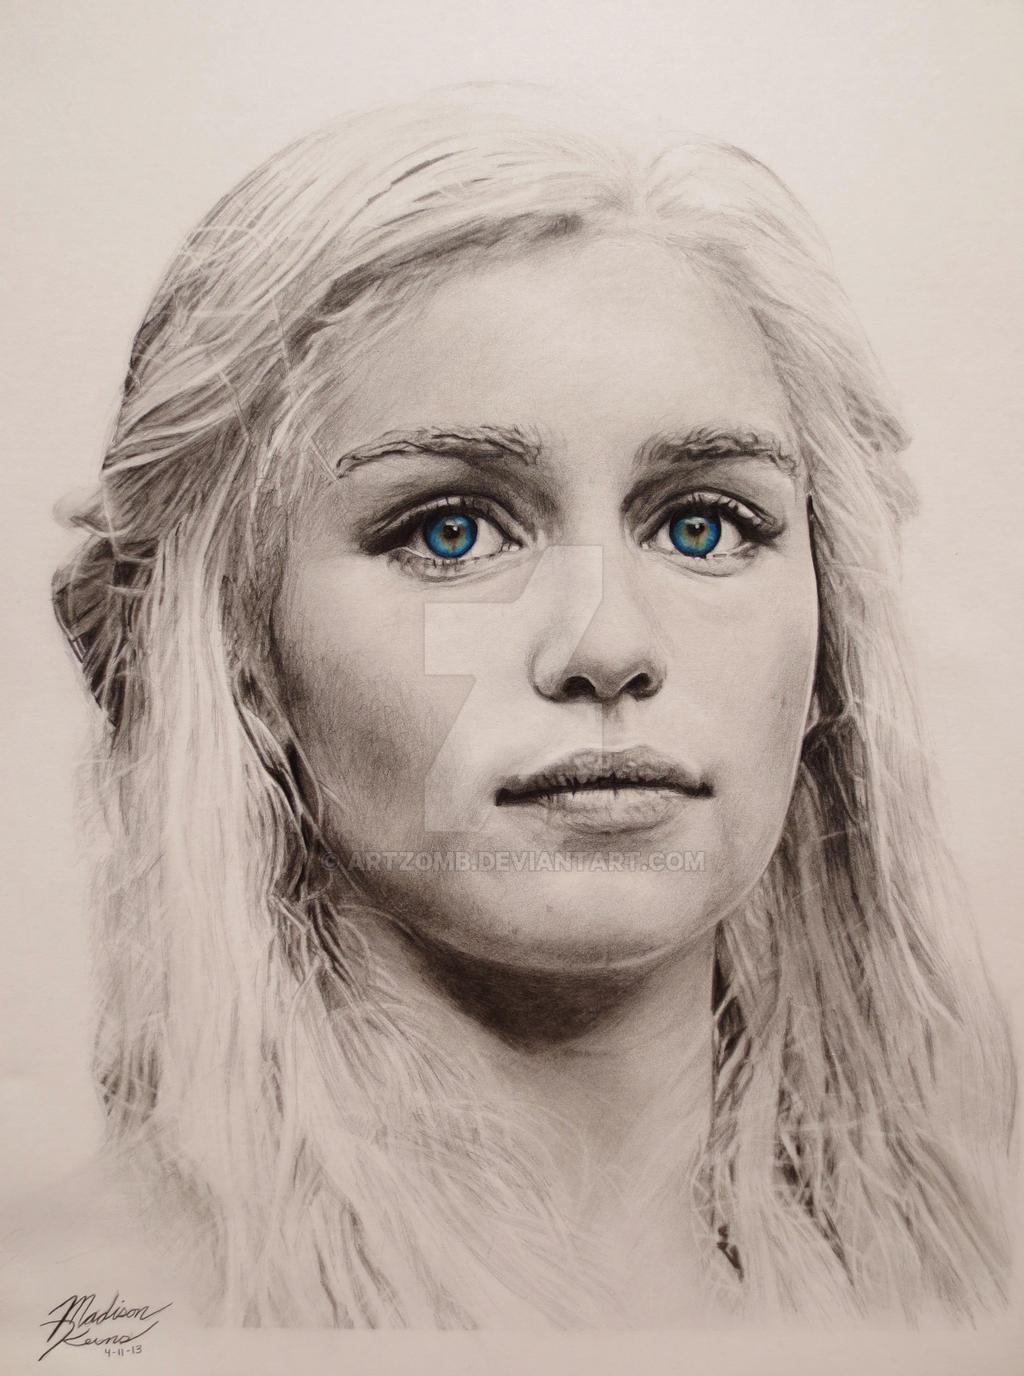 Daenerys Targaryen by ArtZomb